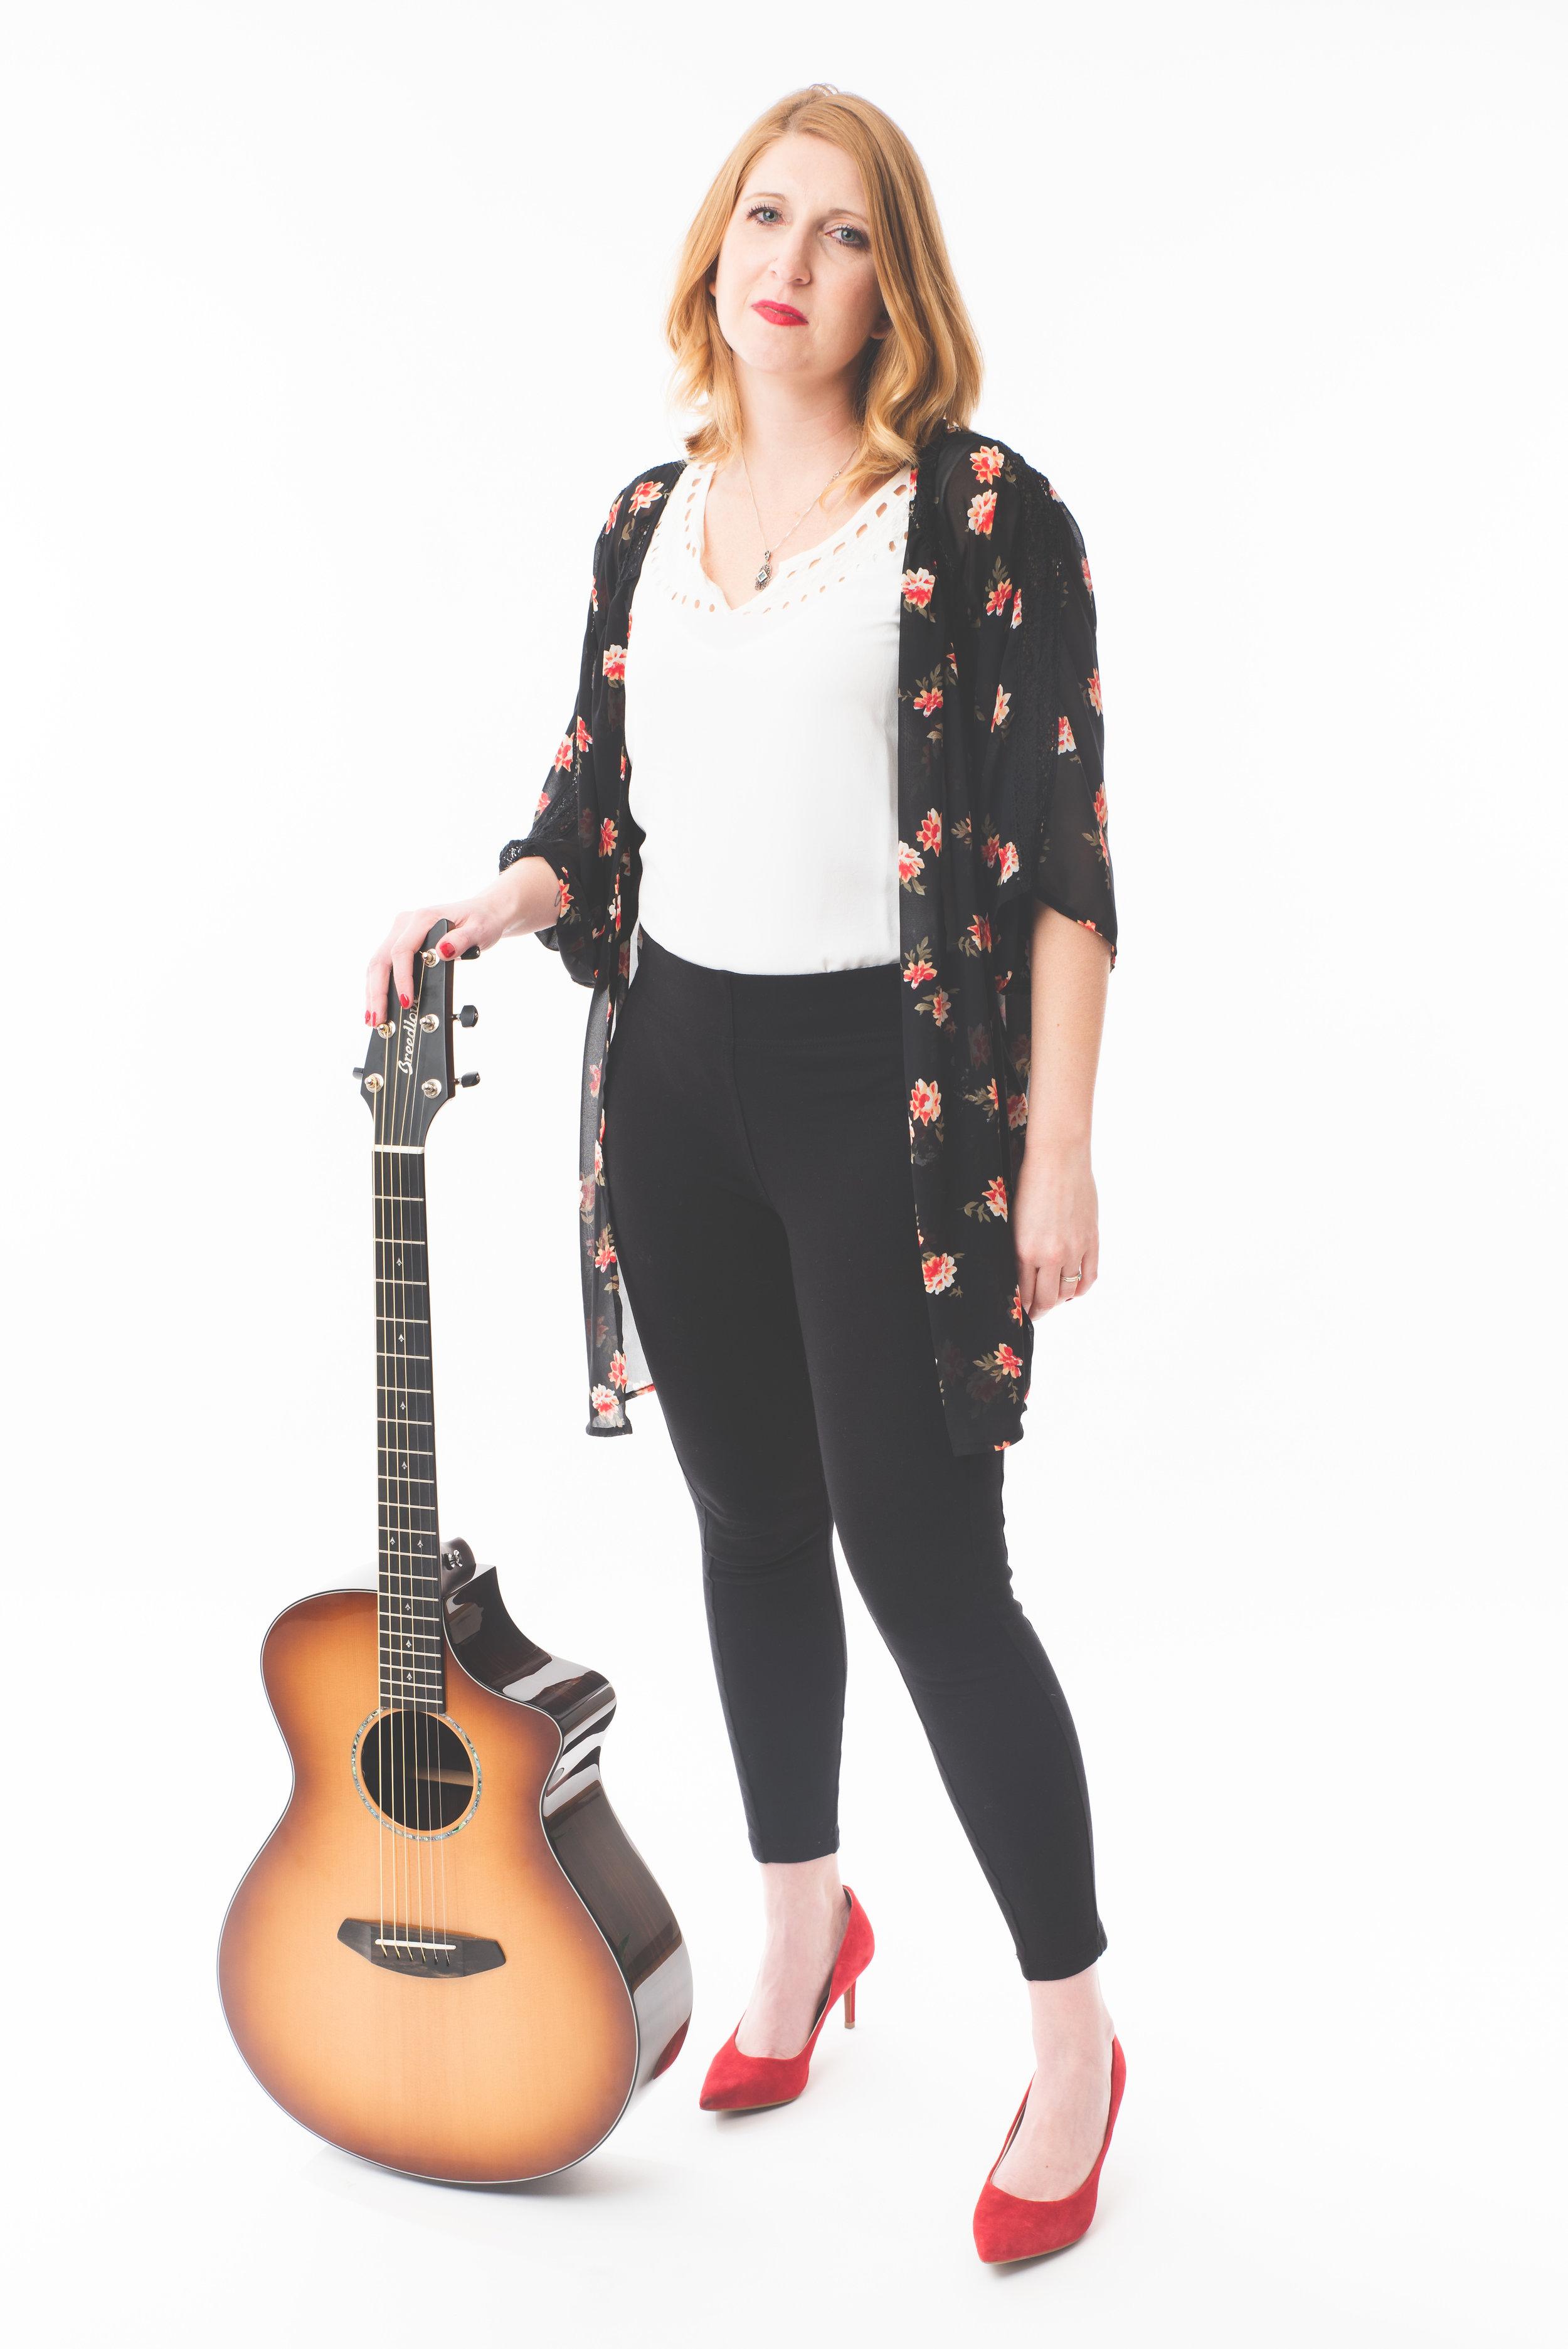 2019_February_15-Megan_Rae_Seals_Personal_Branding-54257.jpg